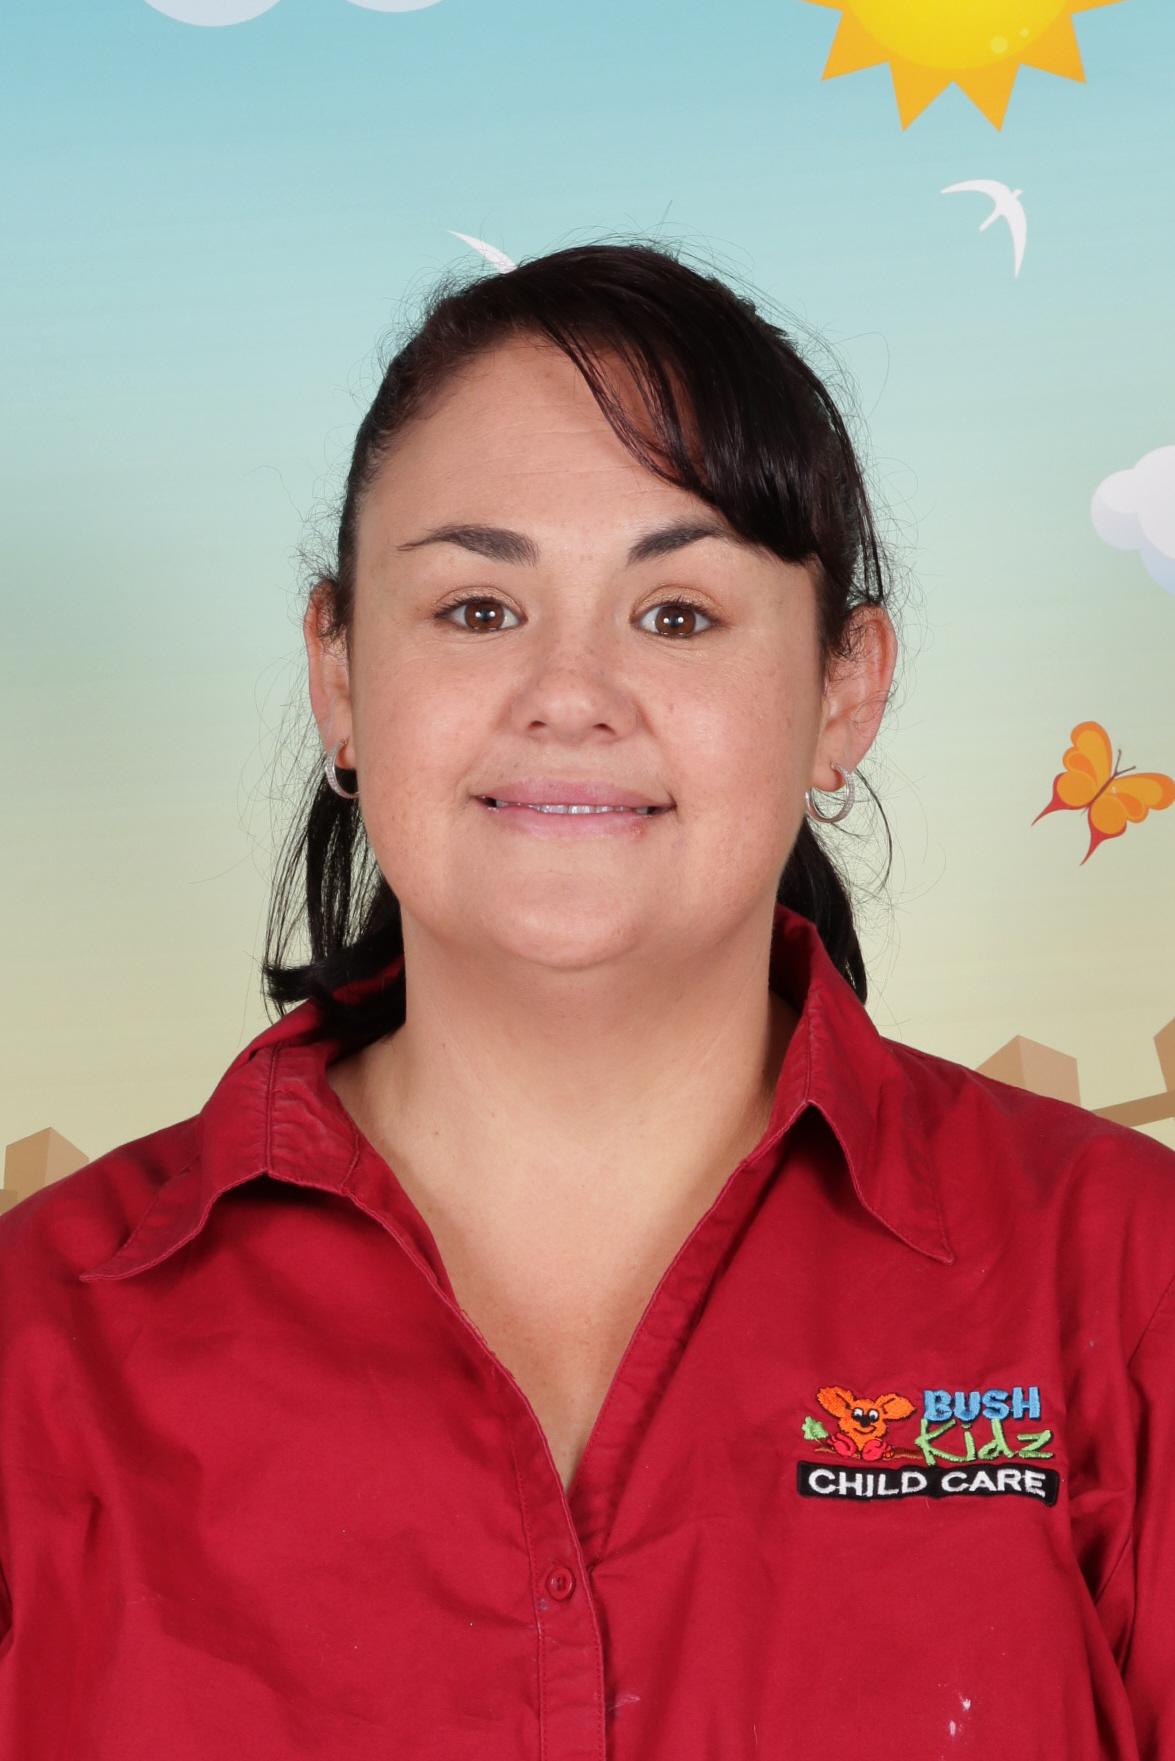 Daniels, Angela | Bush Kidz Child Care Centre Blacksoil Educator